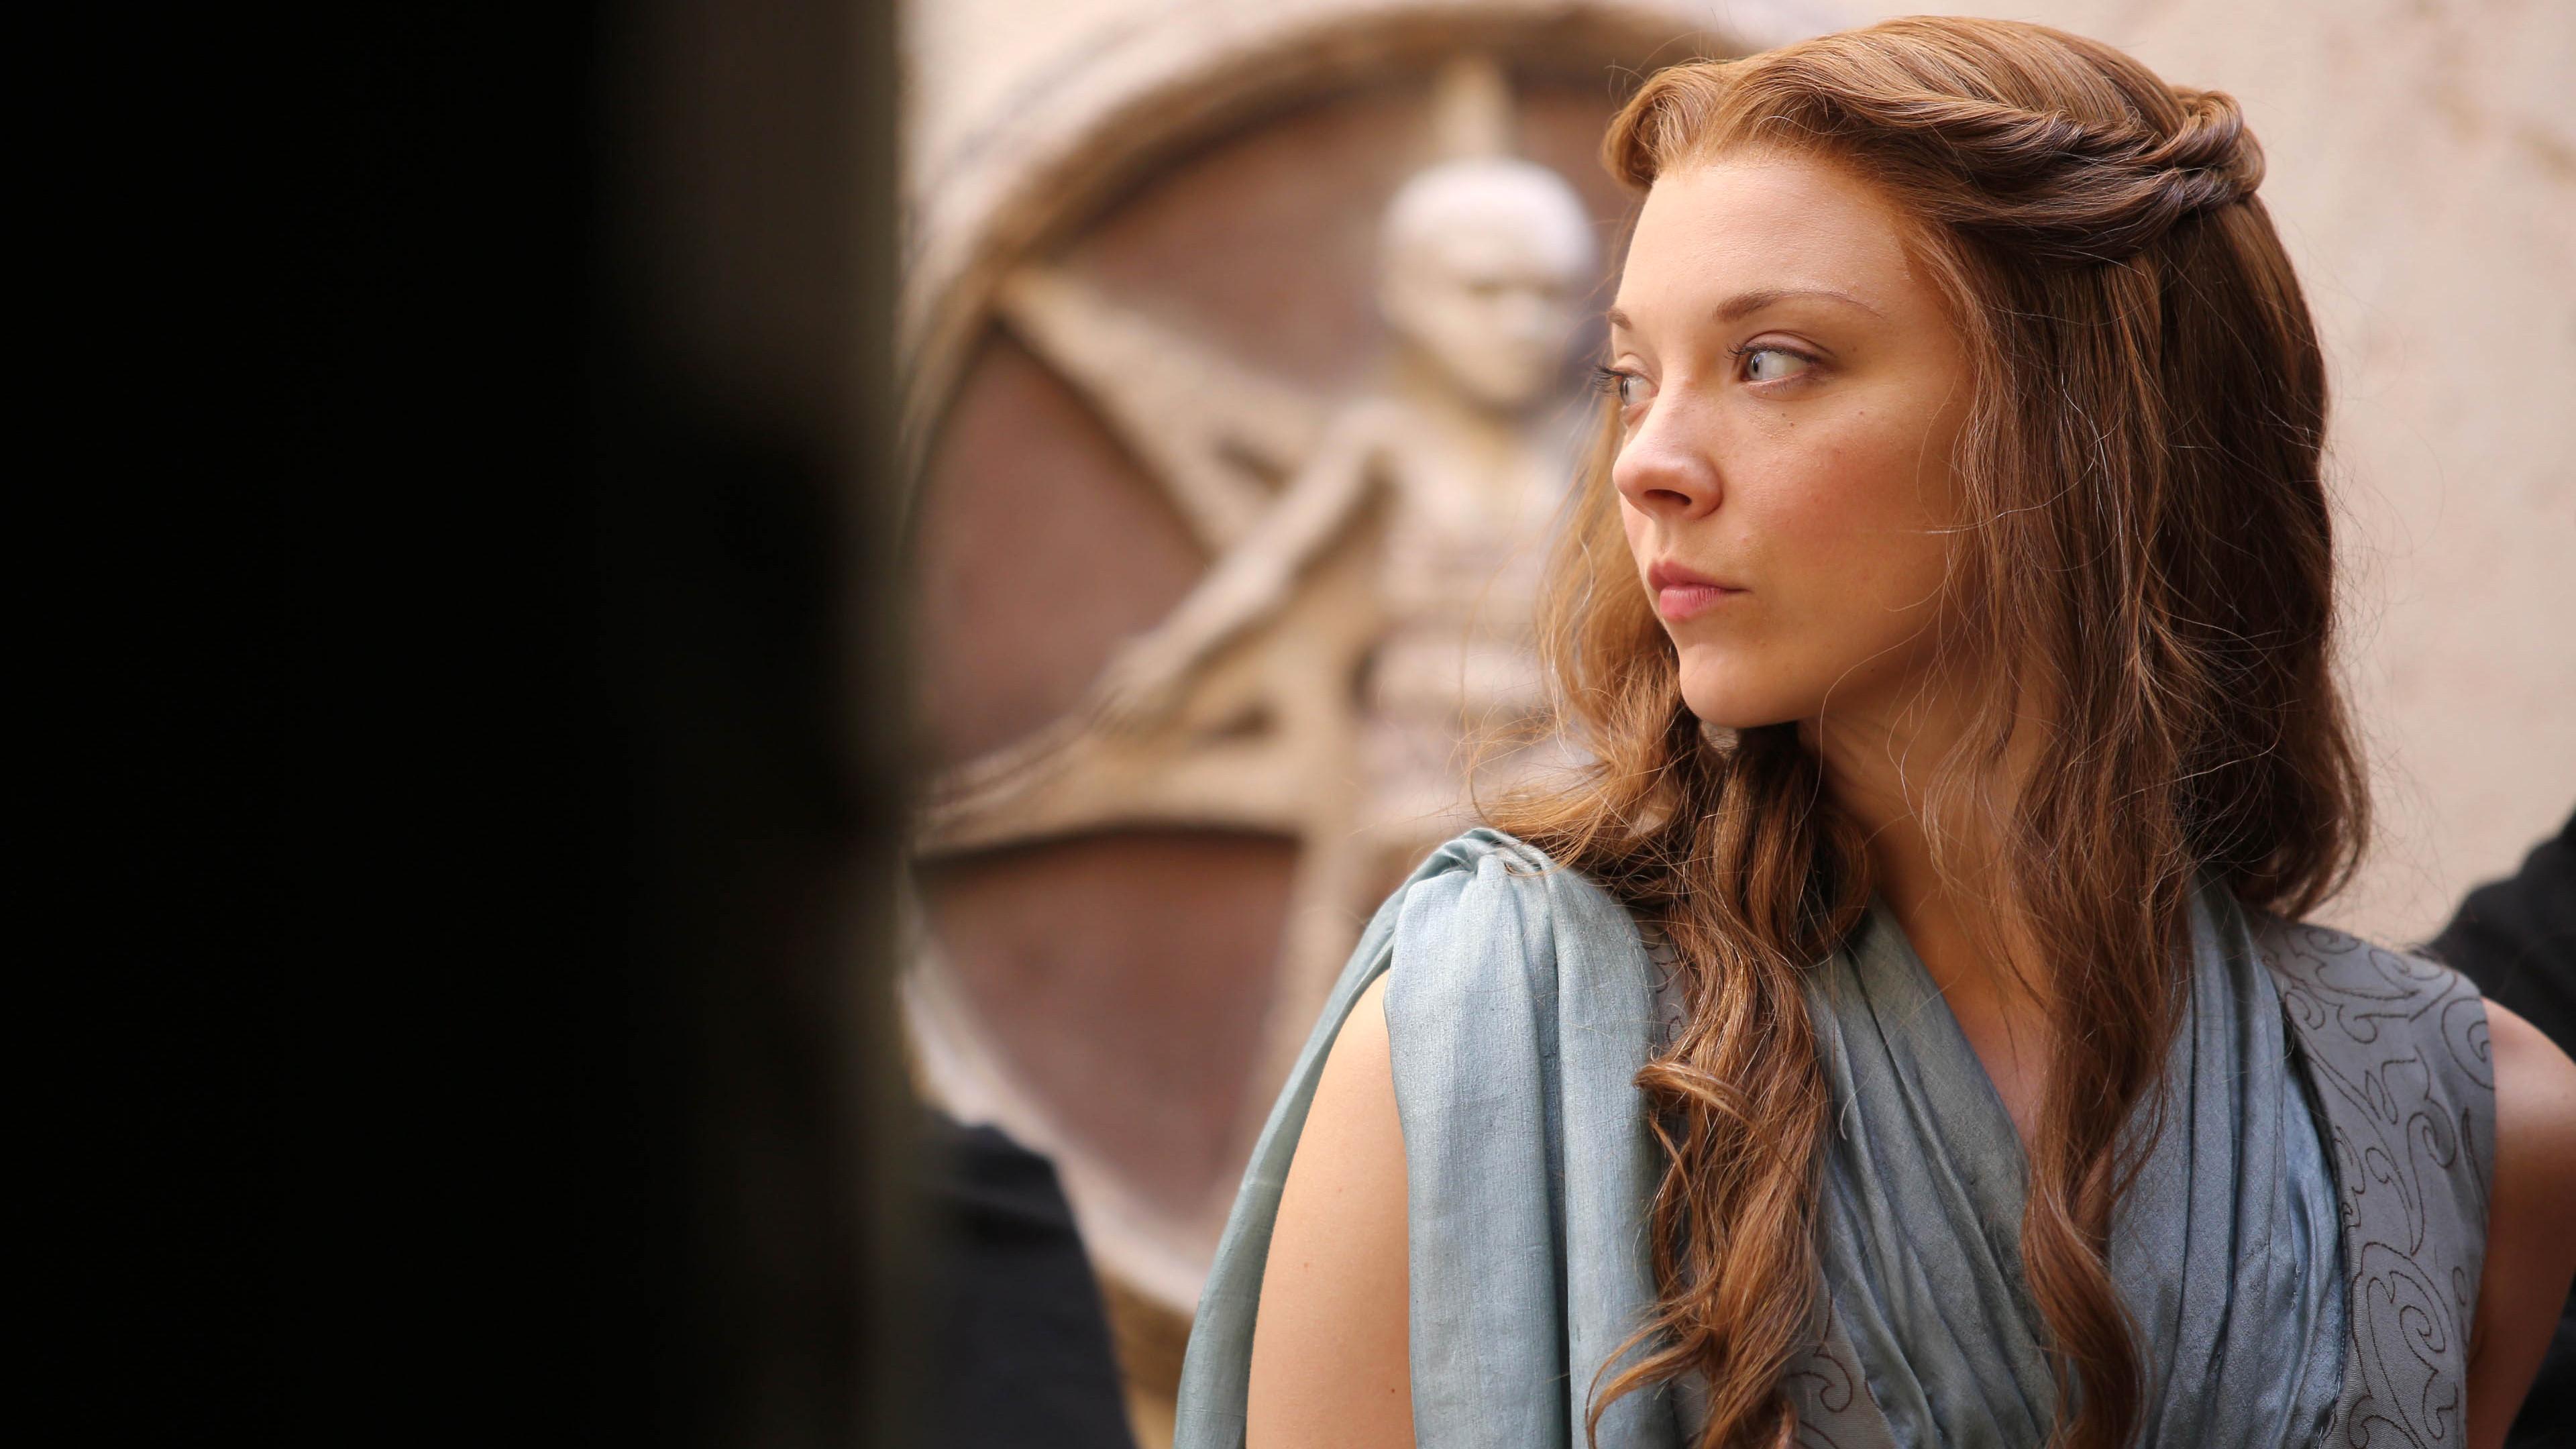 Natalie Dormer in Game of Thrones